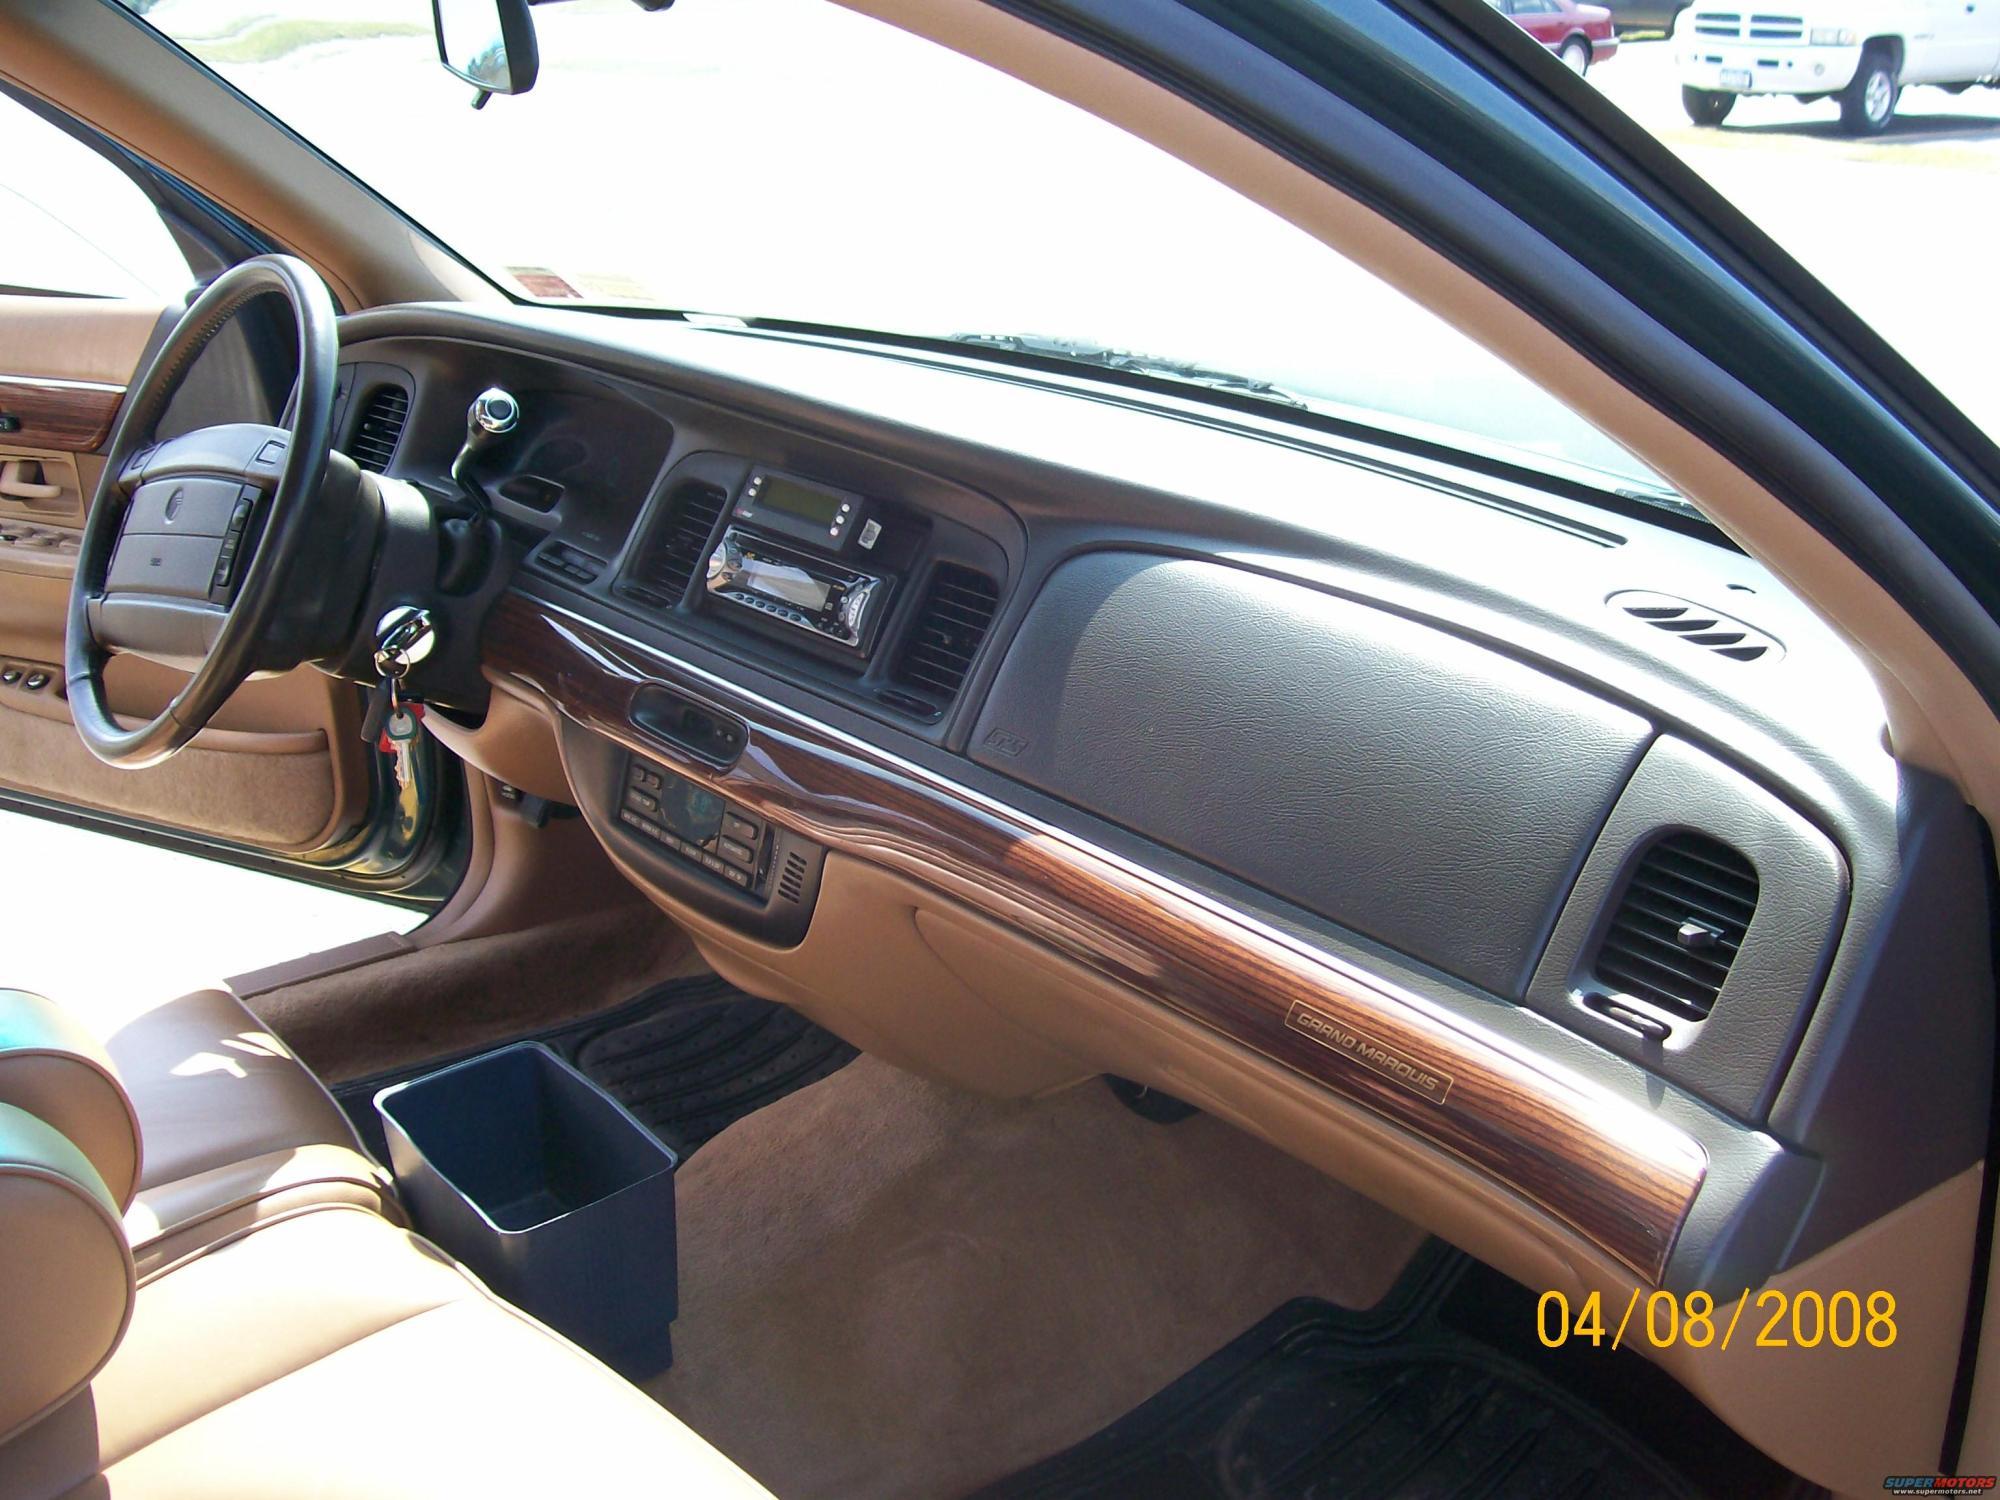 hight resolution of 1995 mercury grand marquis interior picture supermotorsnet